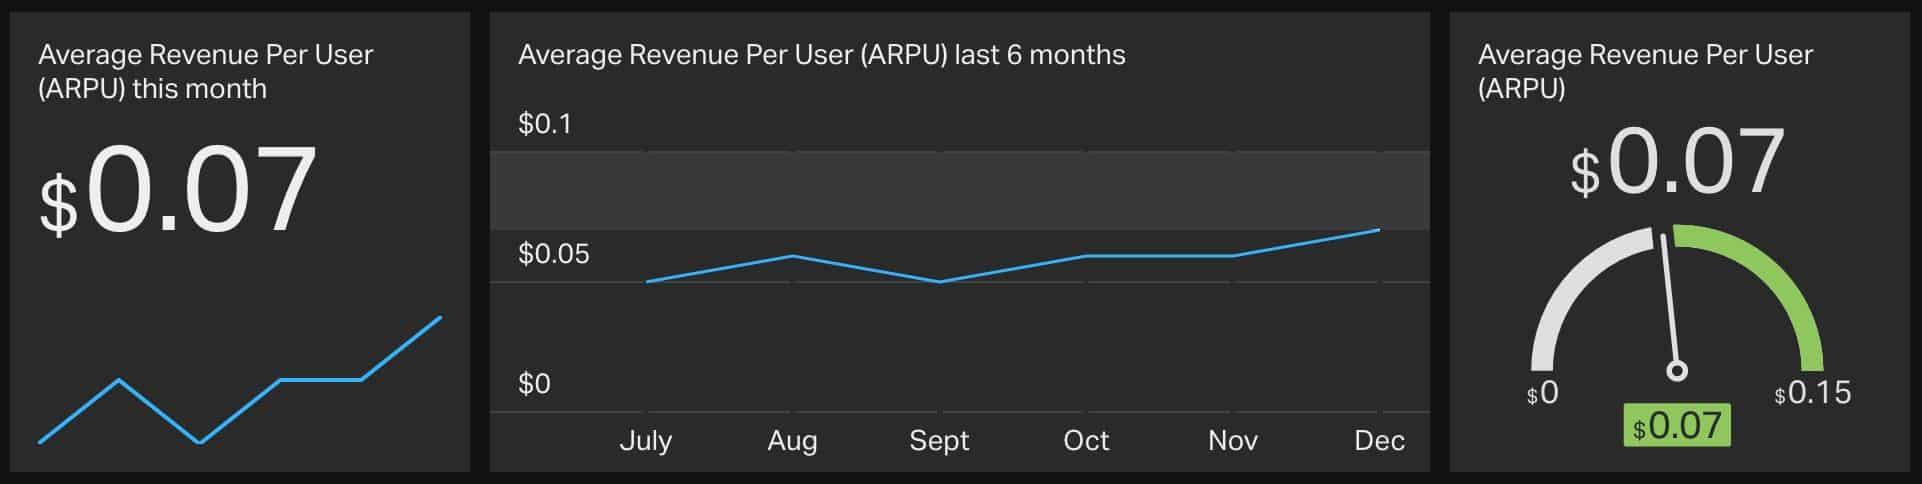 Revenue Per User Mobile App Metric